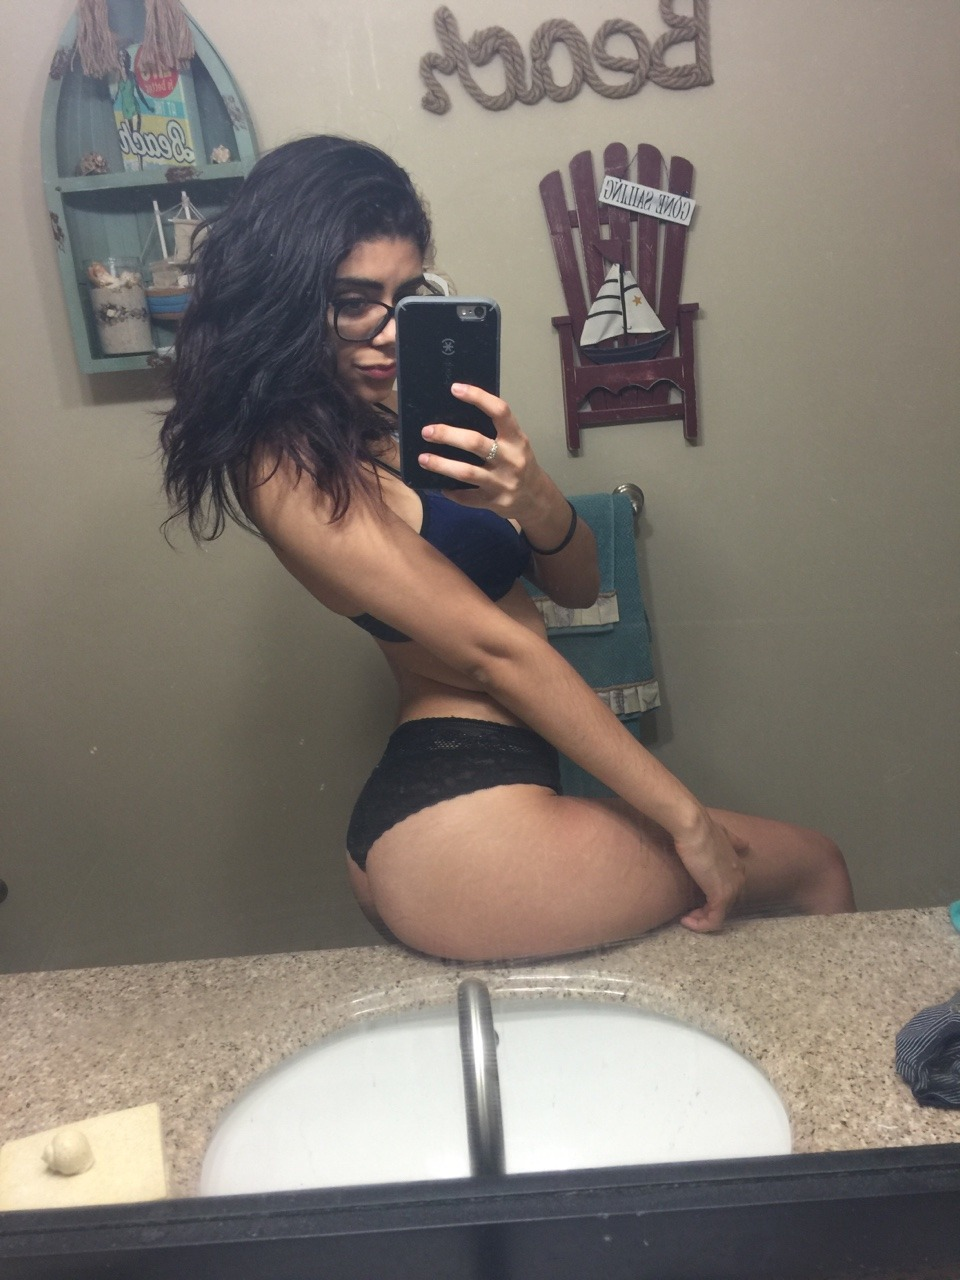 selfie porno de belle fille nue du 35